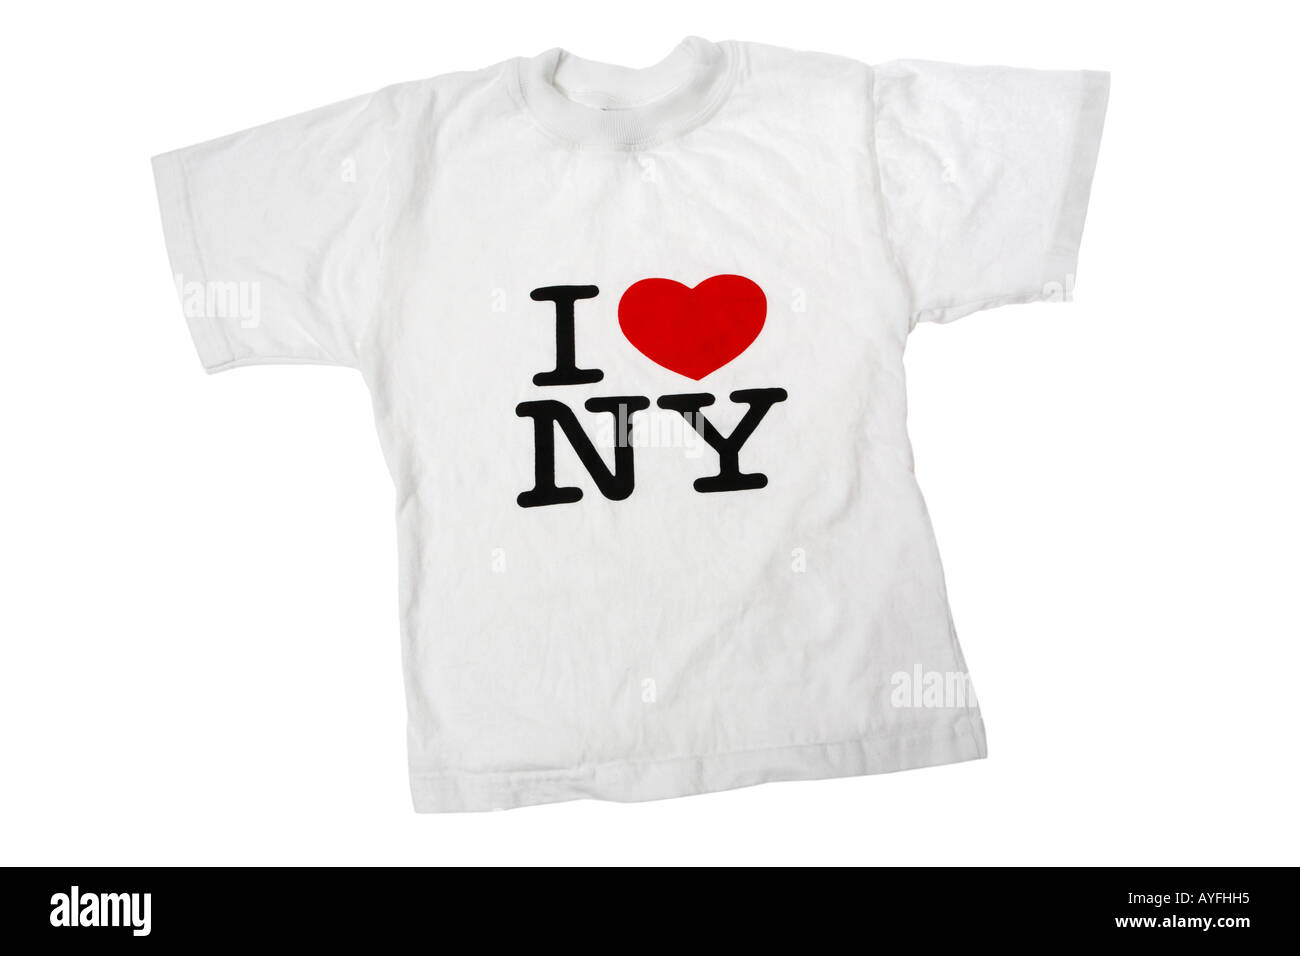 I Love New York  Souvenir T-Shirt - Stock Image